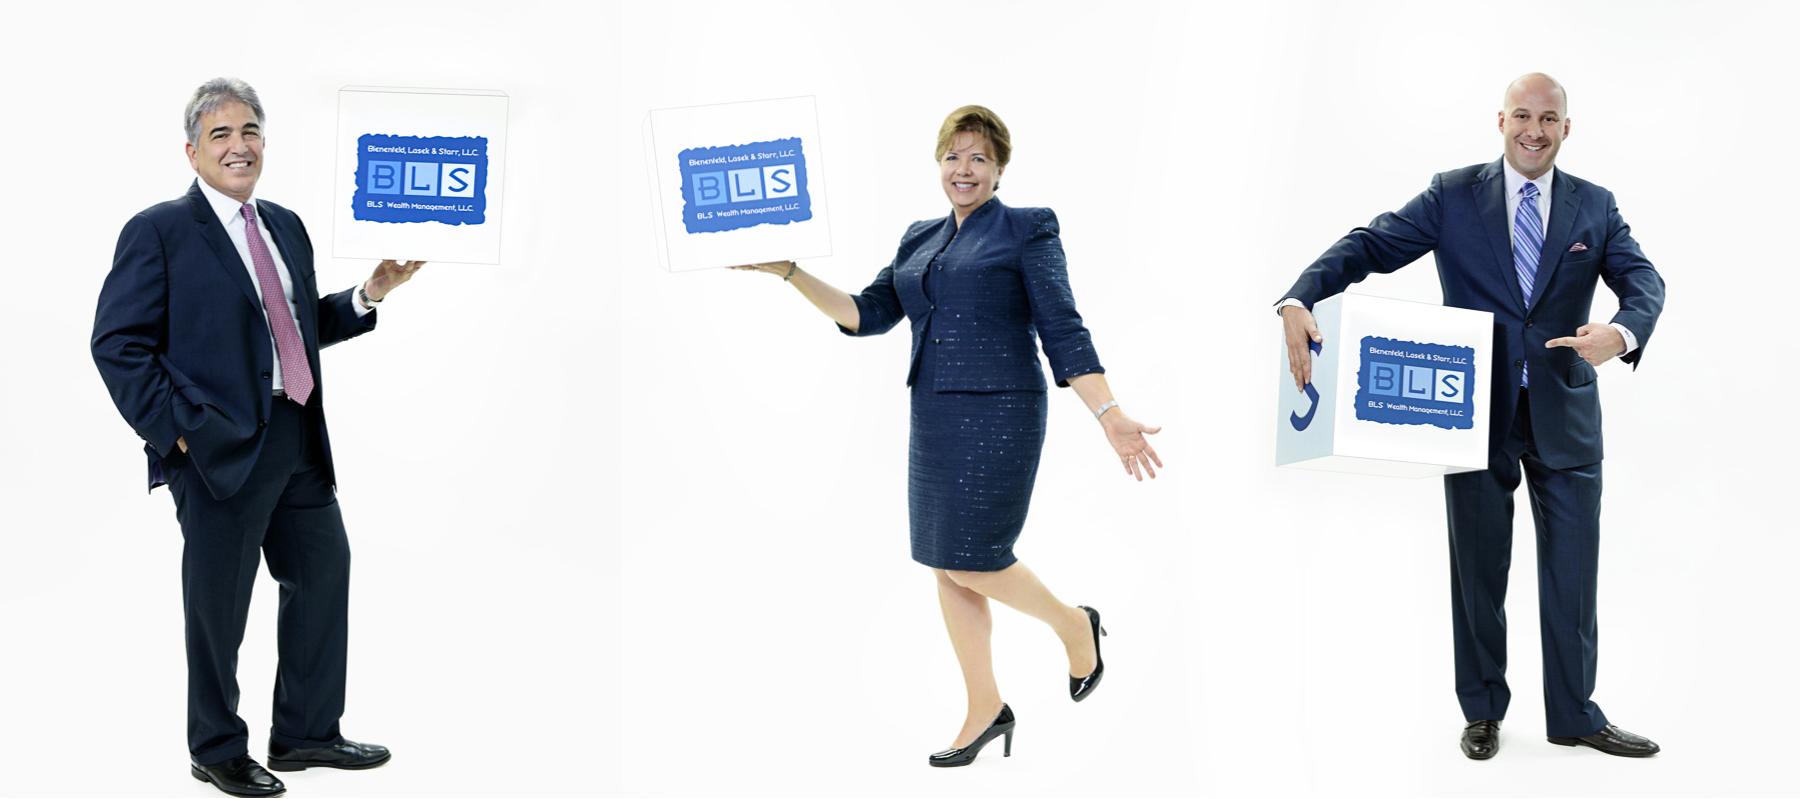 Business Team Corporate Photography / Bienenfeld, Lasek & Starr